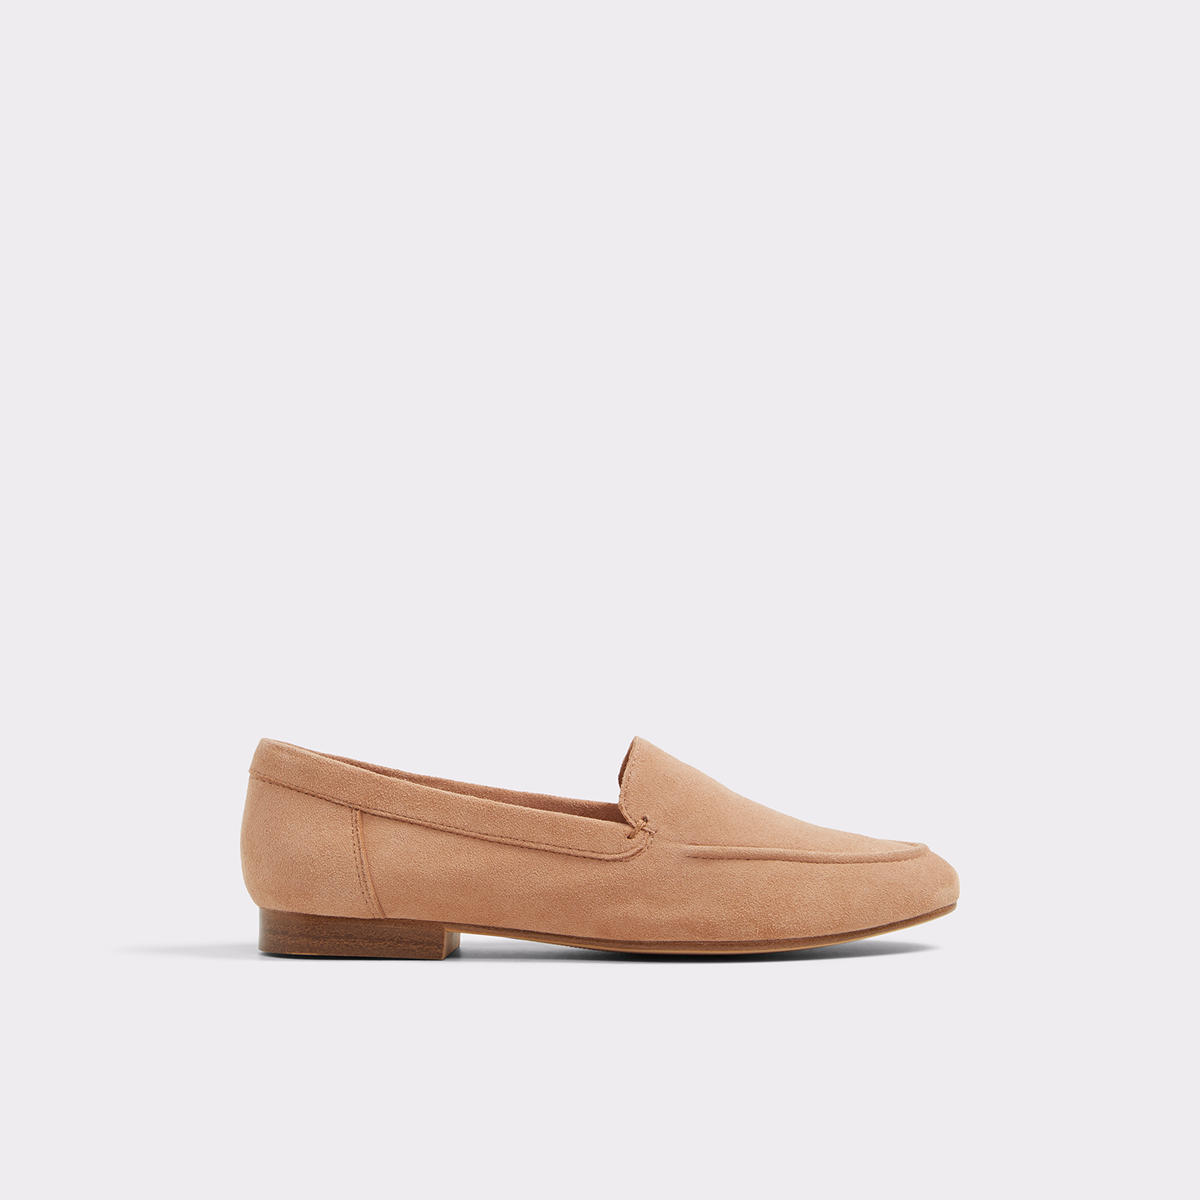 335f5b23001 Joeya Natural Women s Loafers